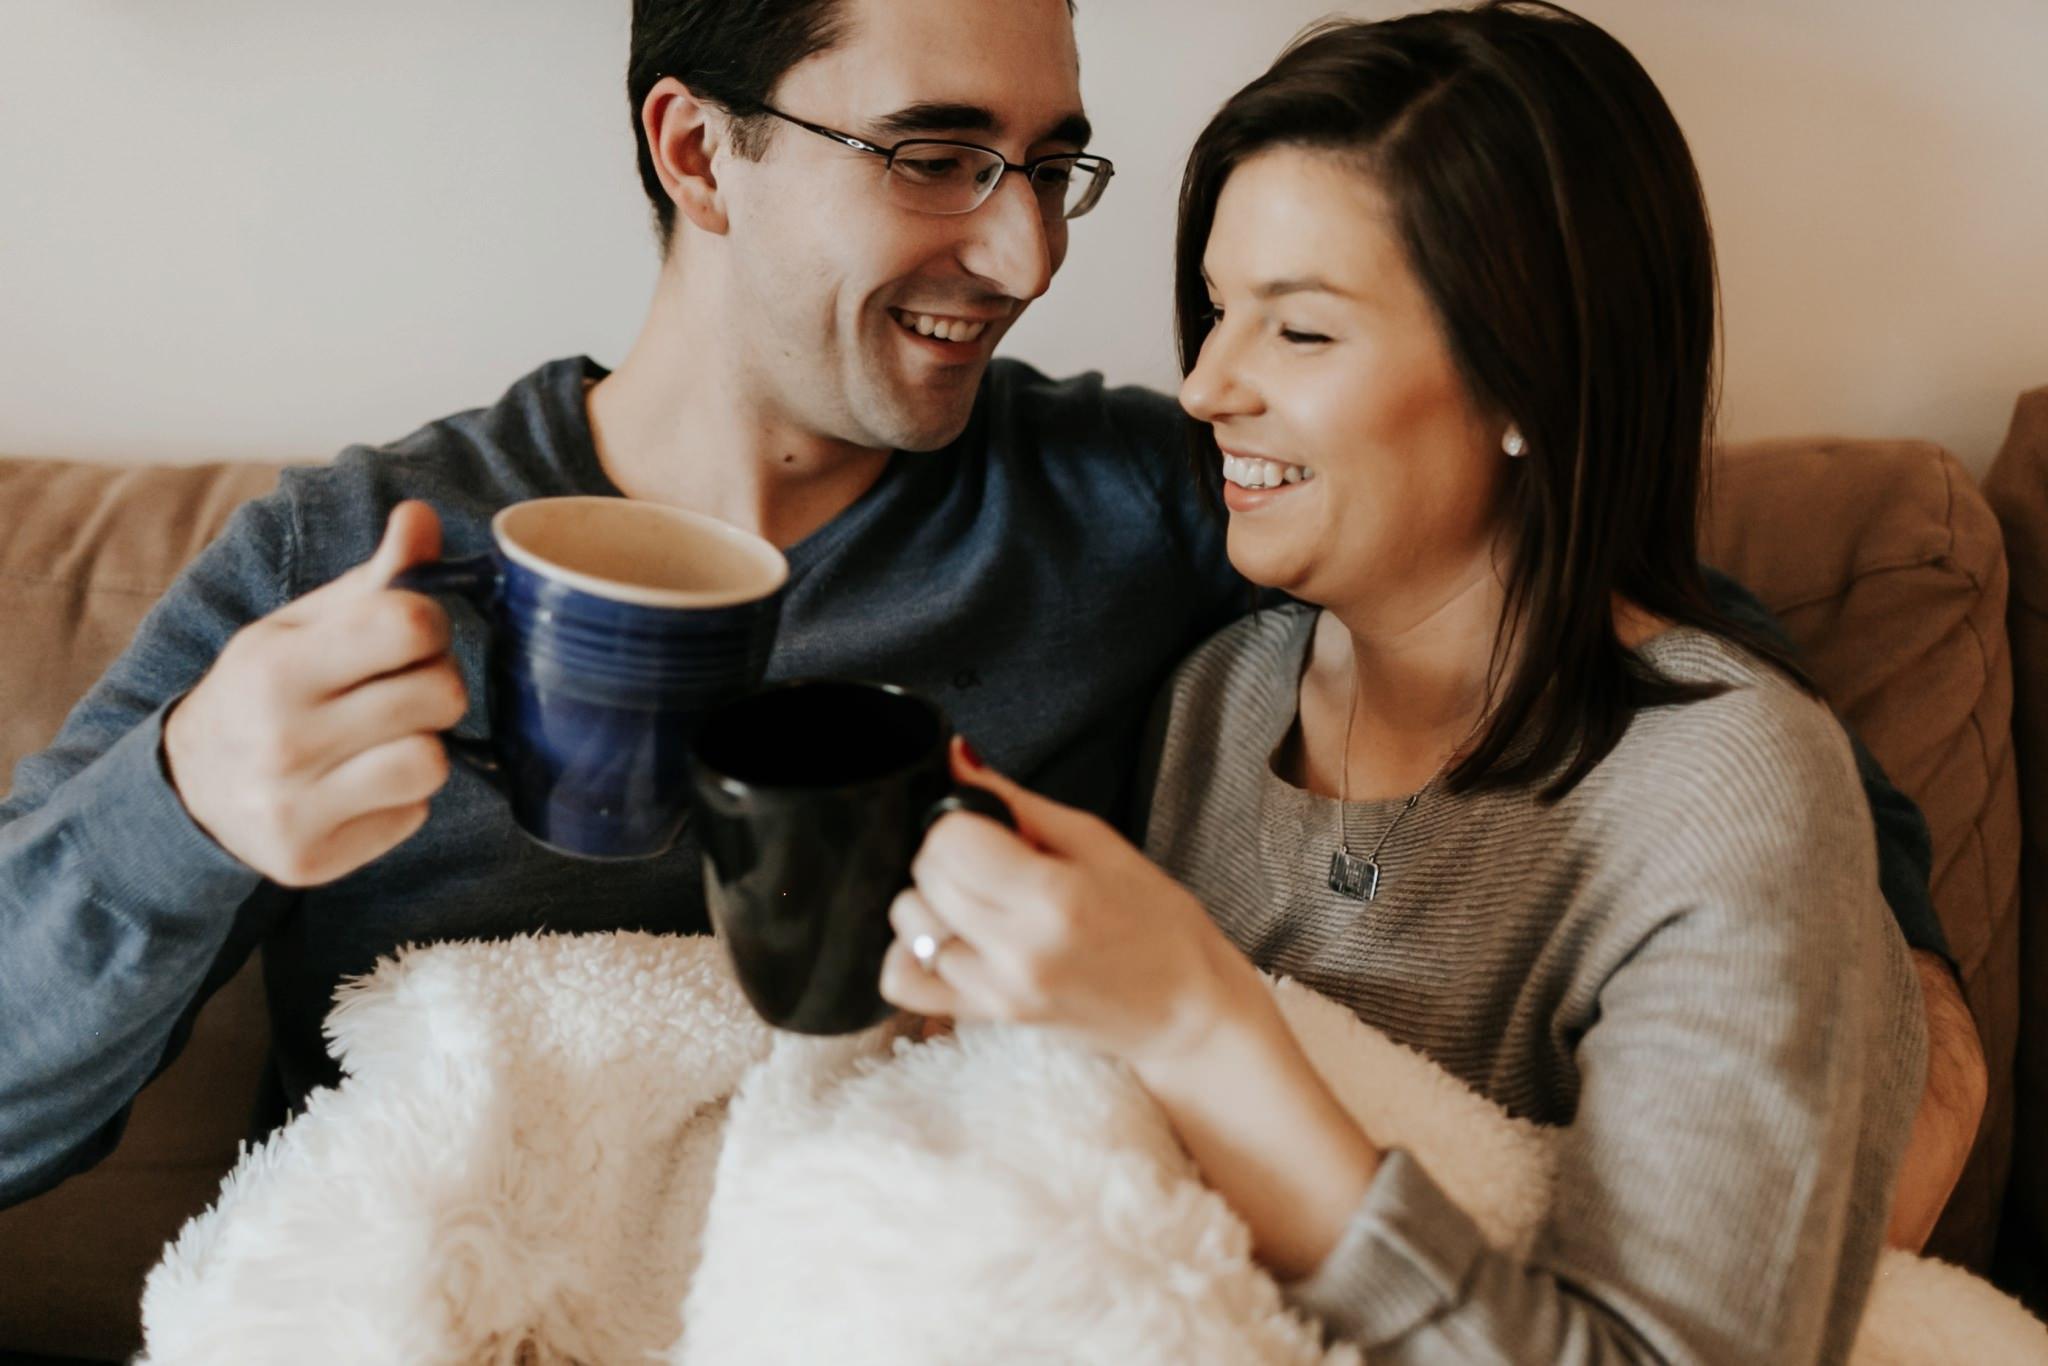 17-10-28 Carly and David Engagement Edited-58_WEB.jpg